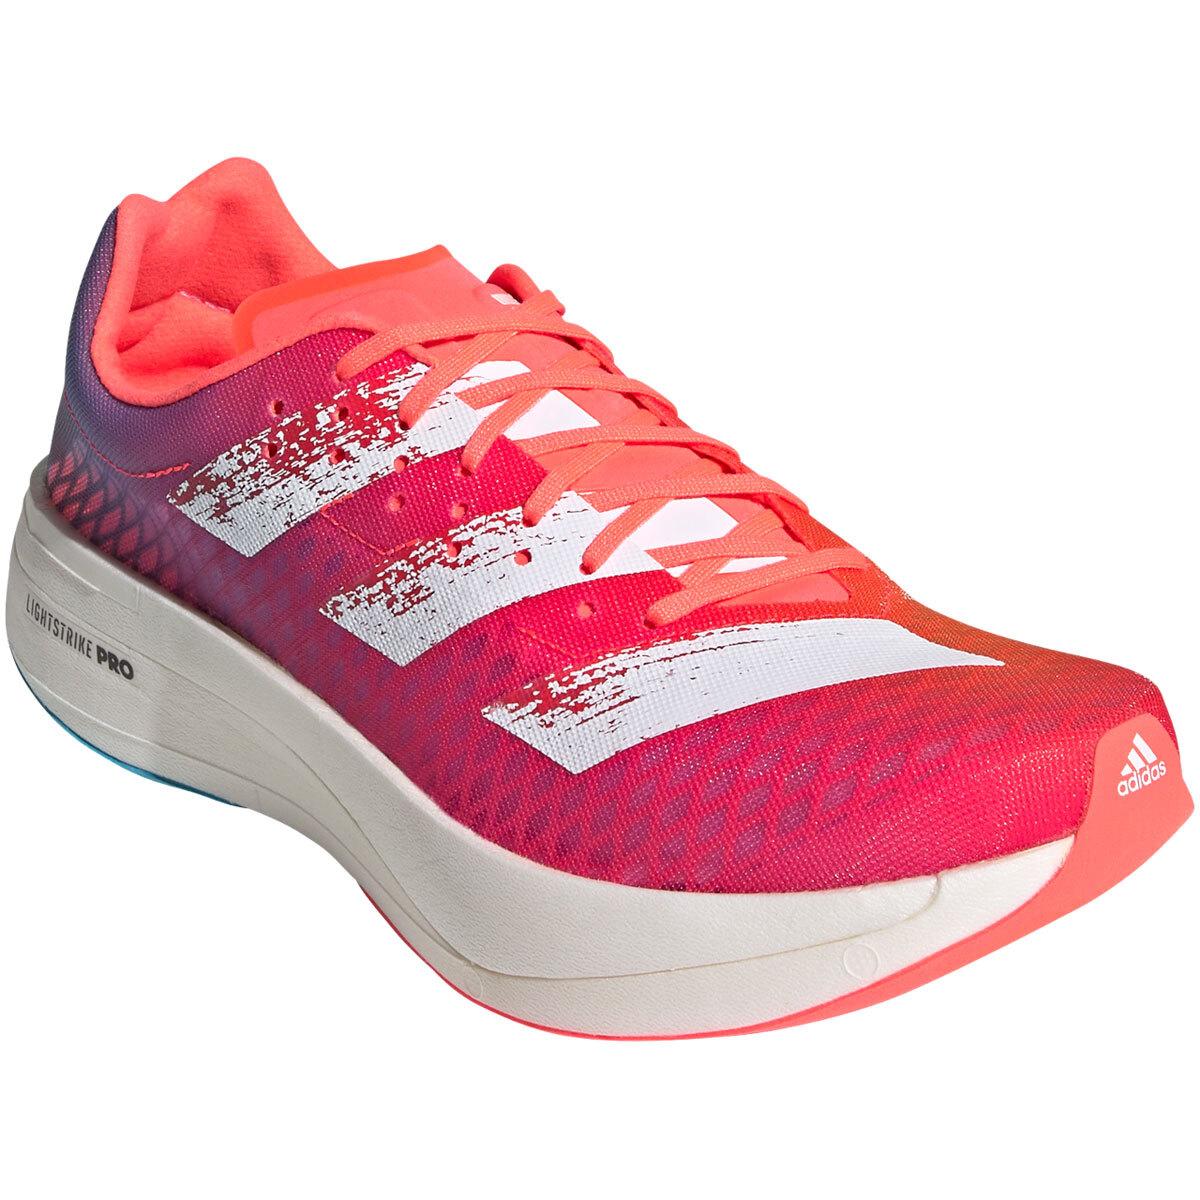 Adidas Adizero Adios Pro Running Shoe - Color: Signal Pink/Cloud White/Shock Pink - Size: M4/W5.5 - Width: Regular, Signal Pink/Cloud White/Shock Pink, large, image 2